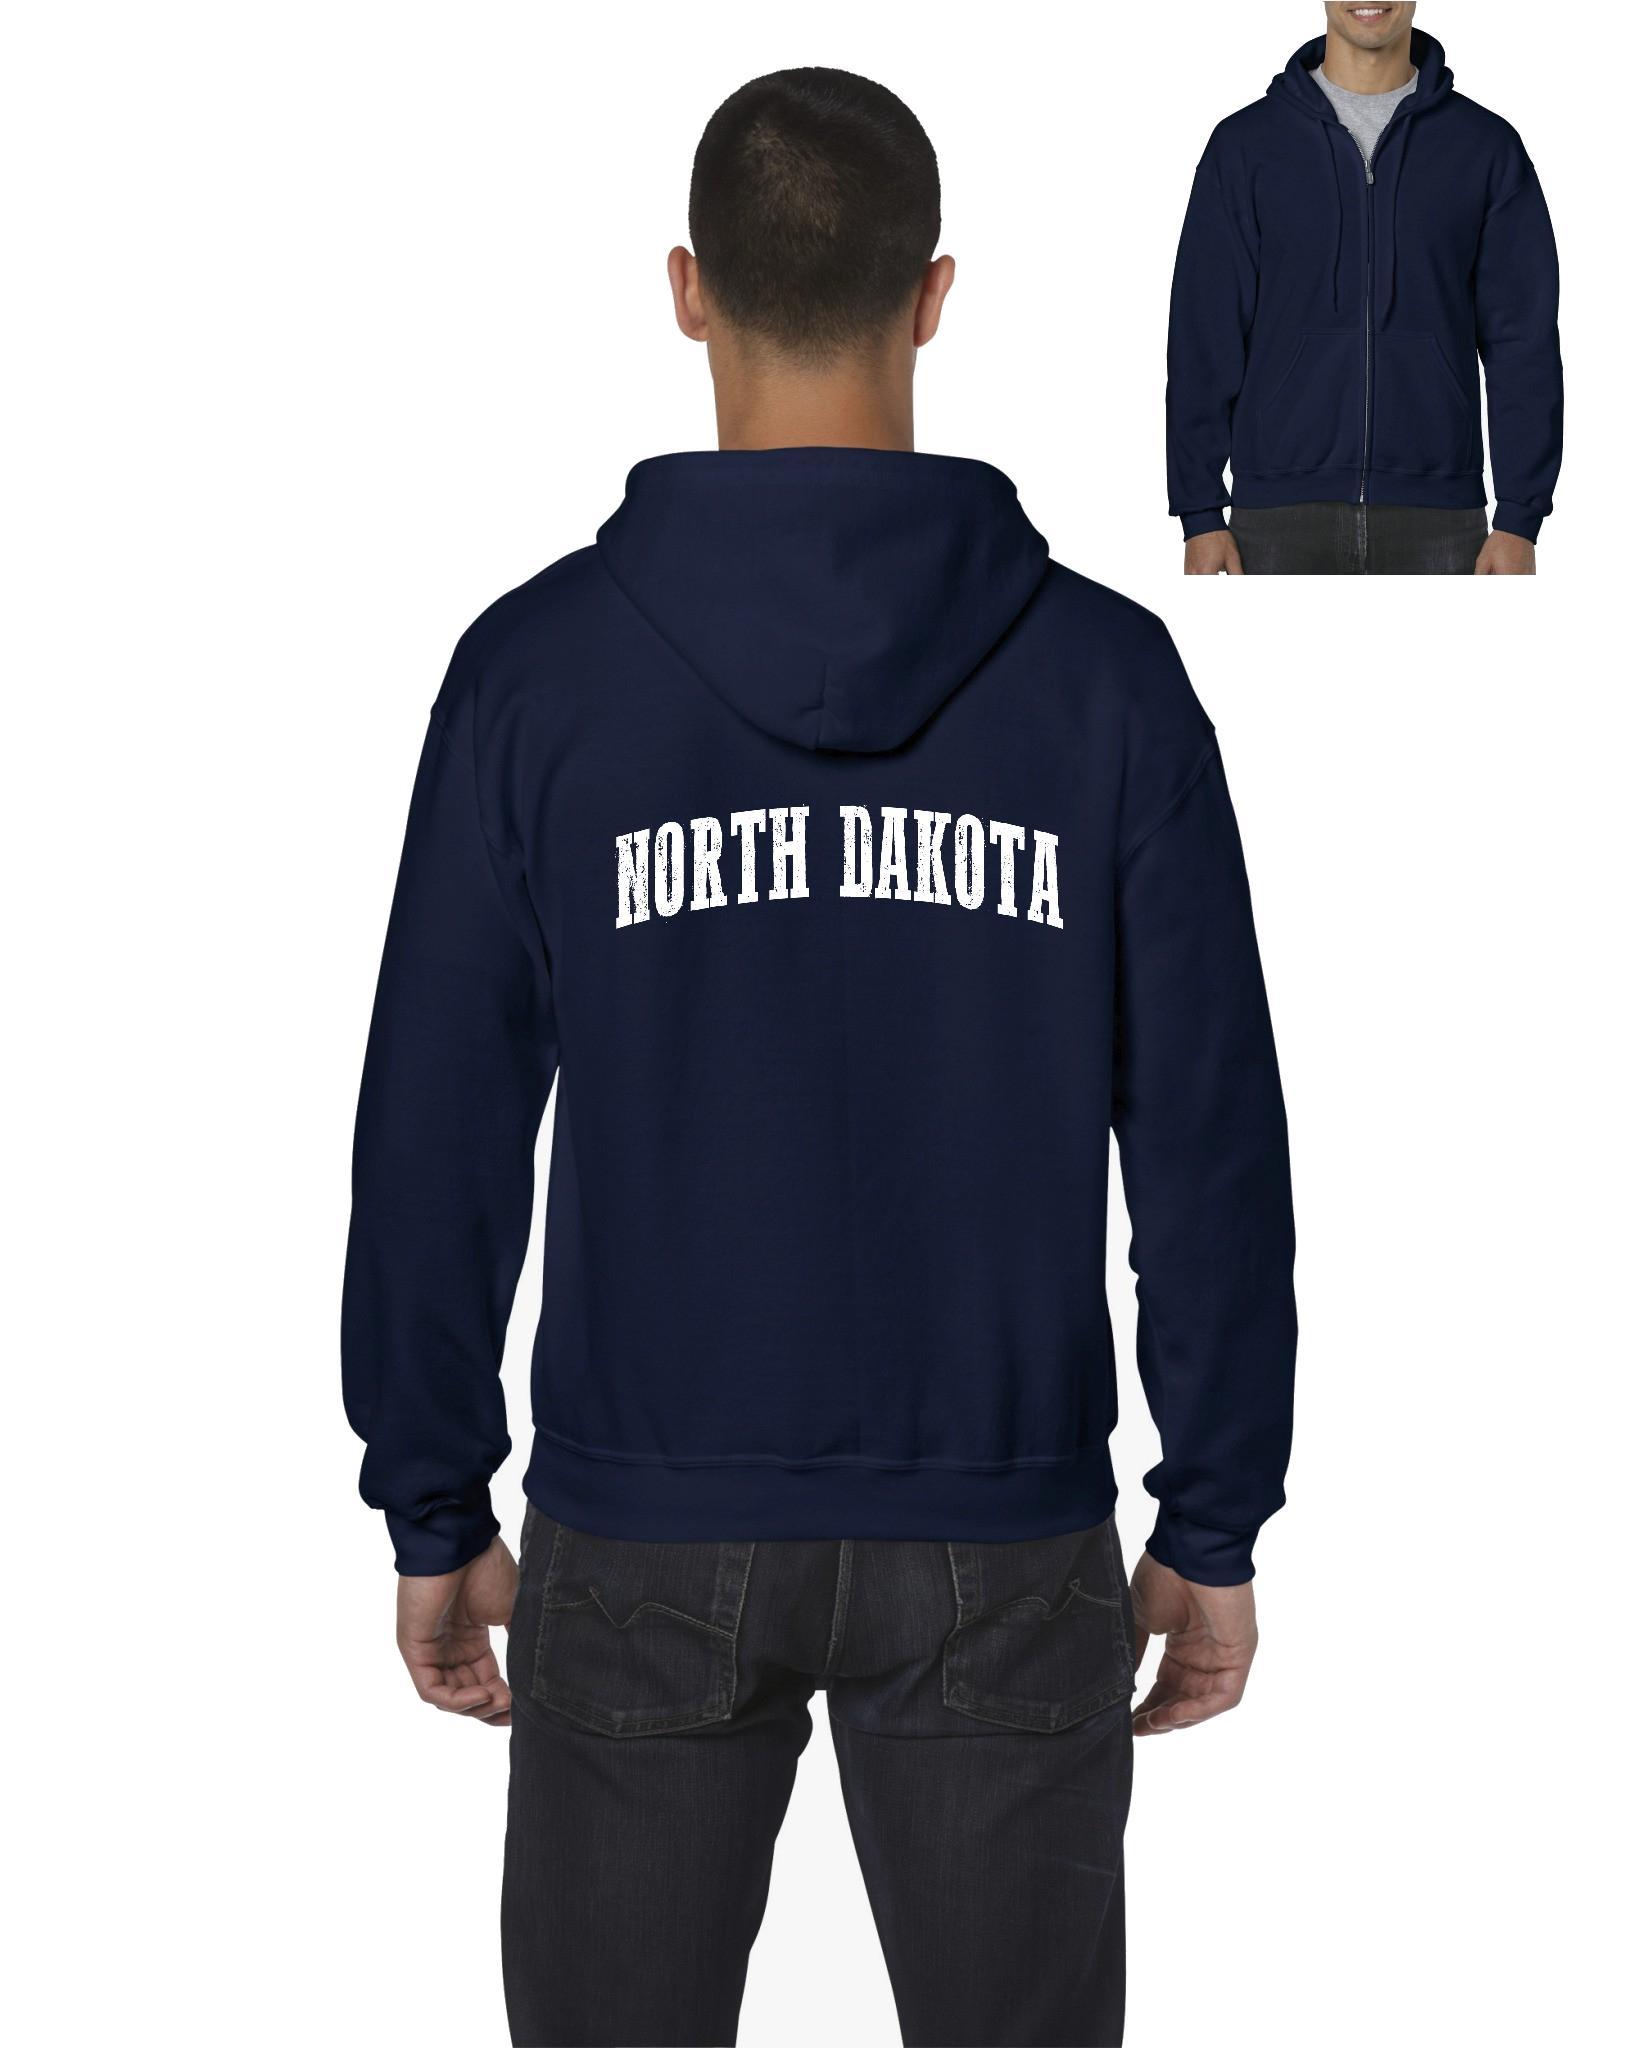 North Dakota American States ND Mens Hoodies Zip Up Sweater by